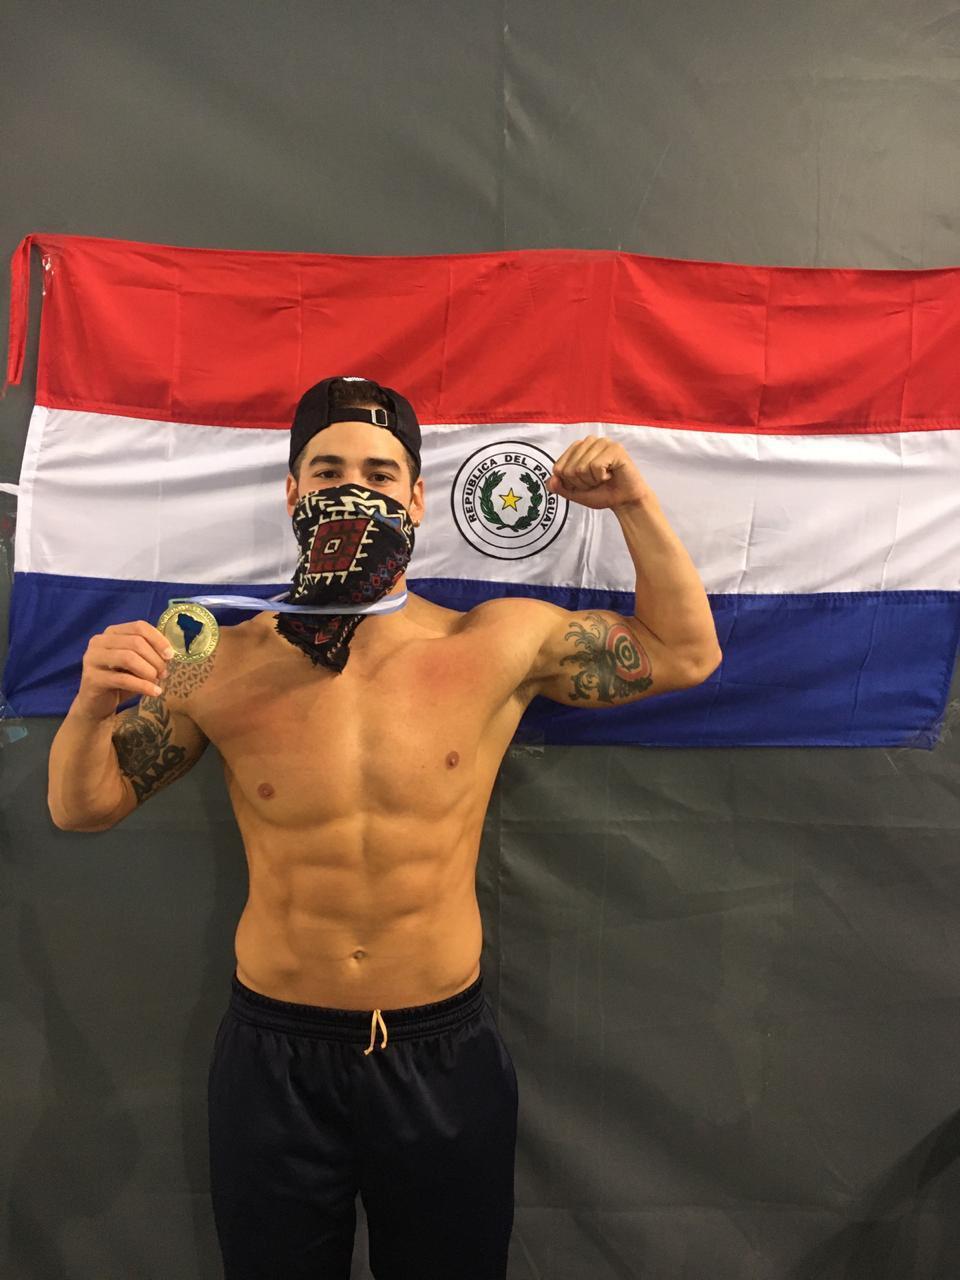 Prono logra Medalla de Oro en natación para Paraguay